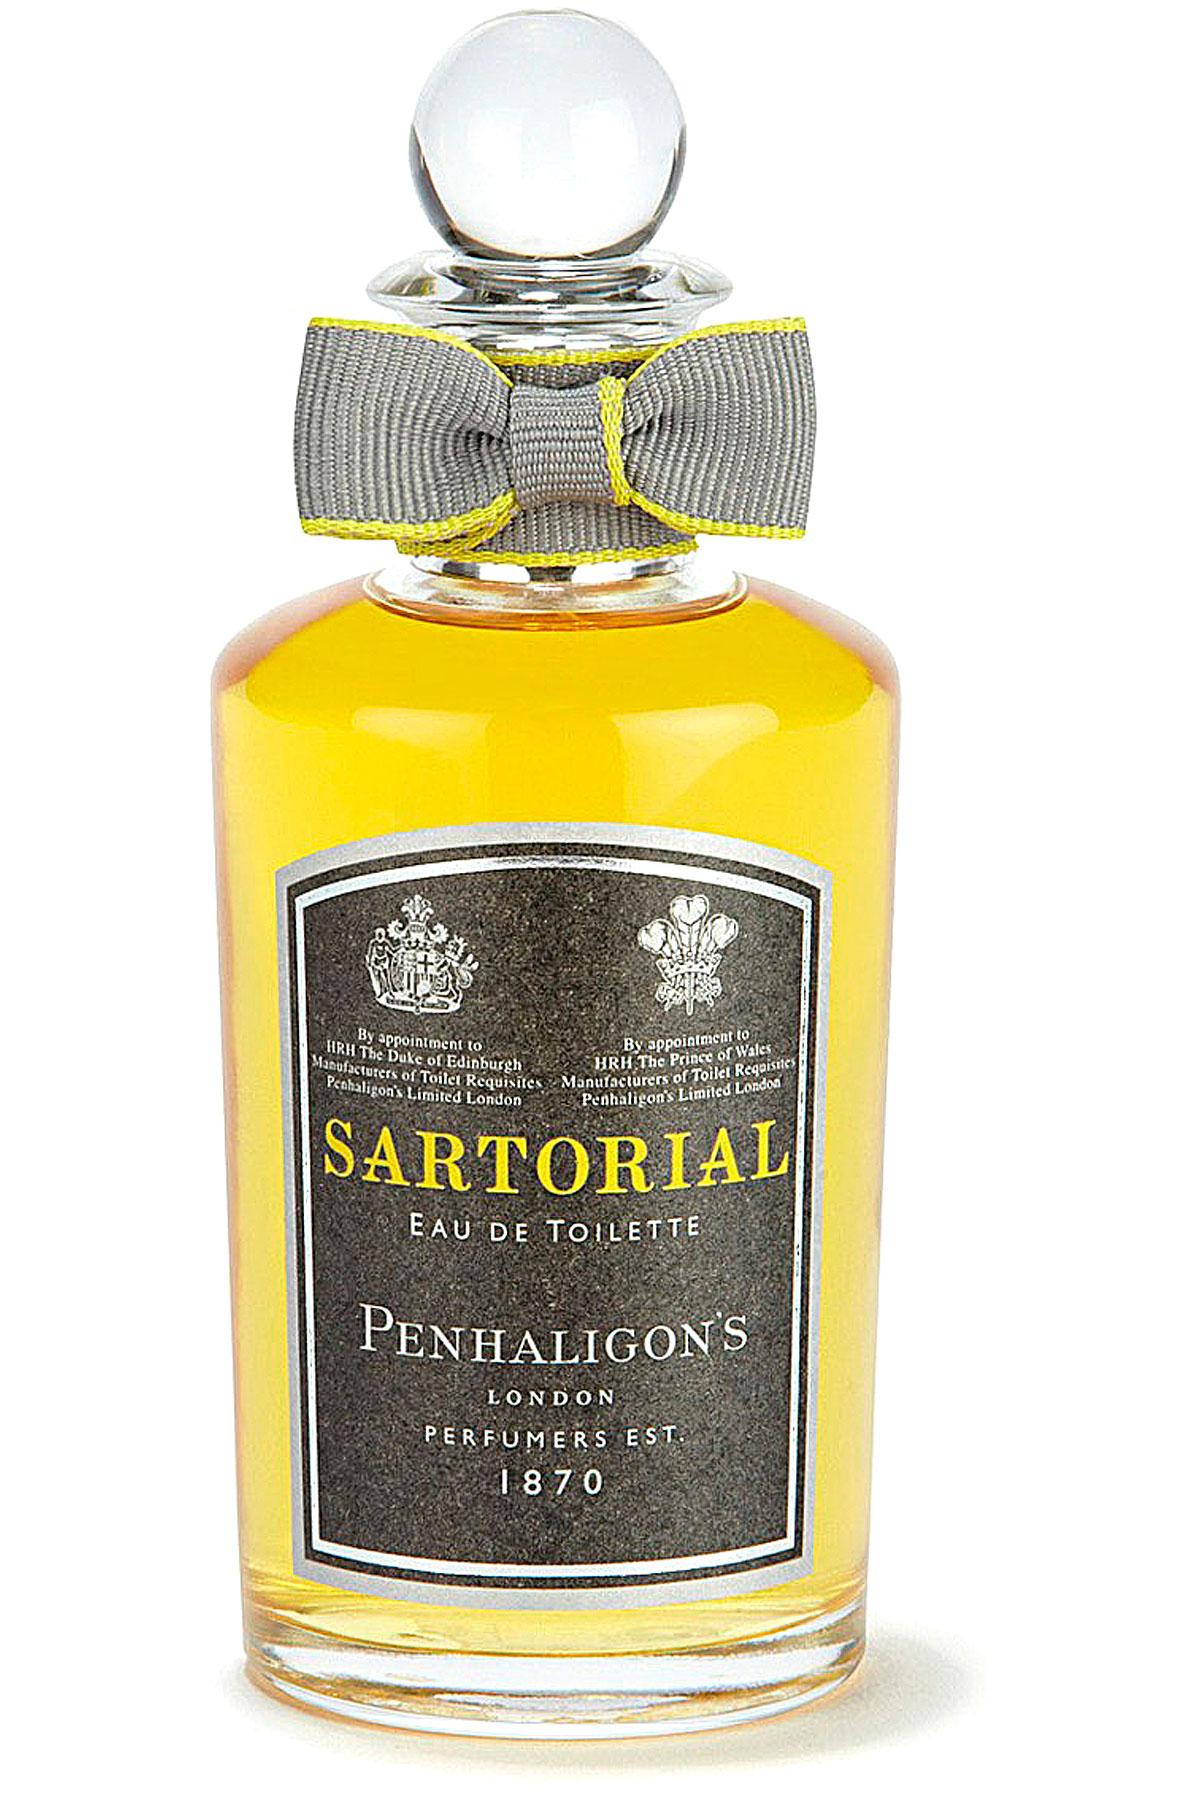 Penhaligon s London Fragrances for Men, Sartorial - Eau De Toilette - 50-100 Ml, 2019, 100 ml 50 ml